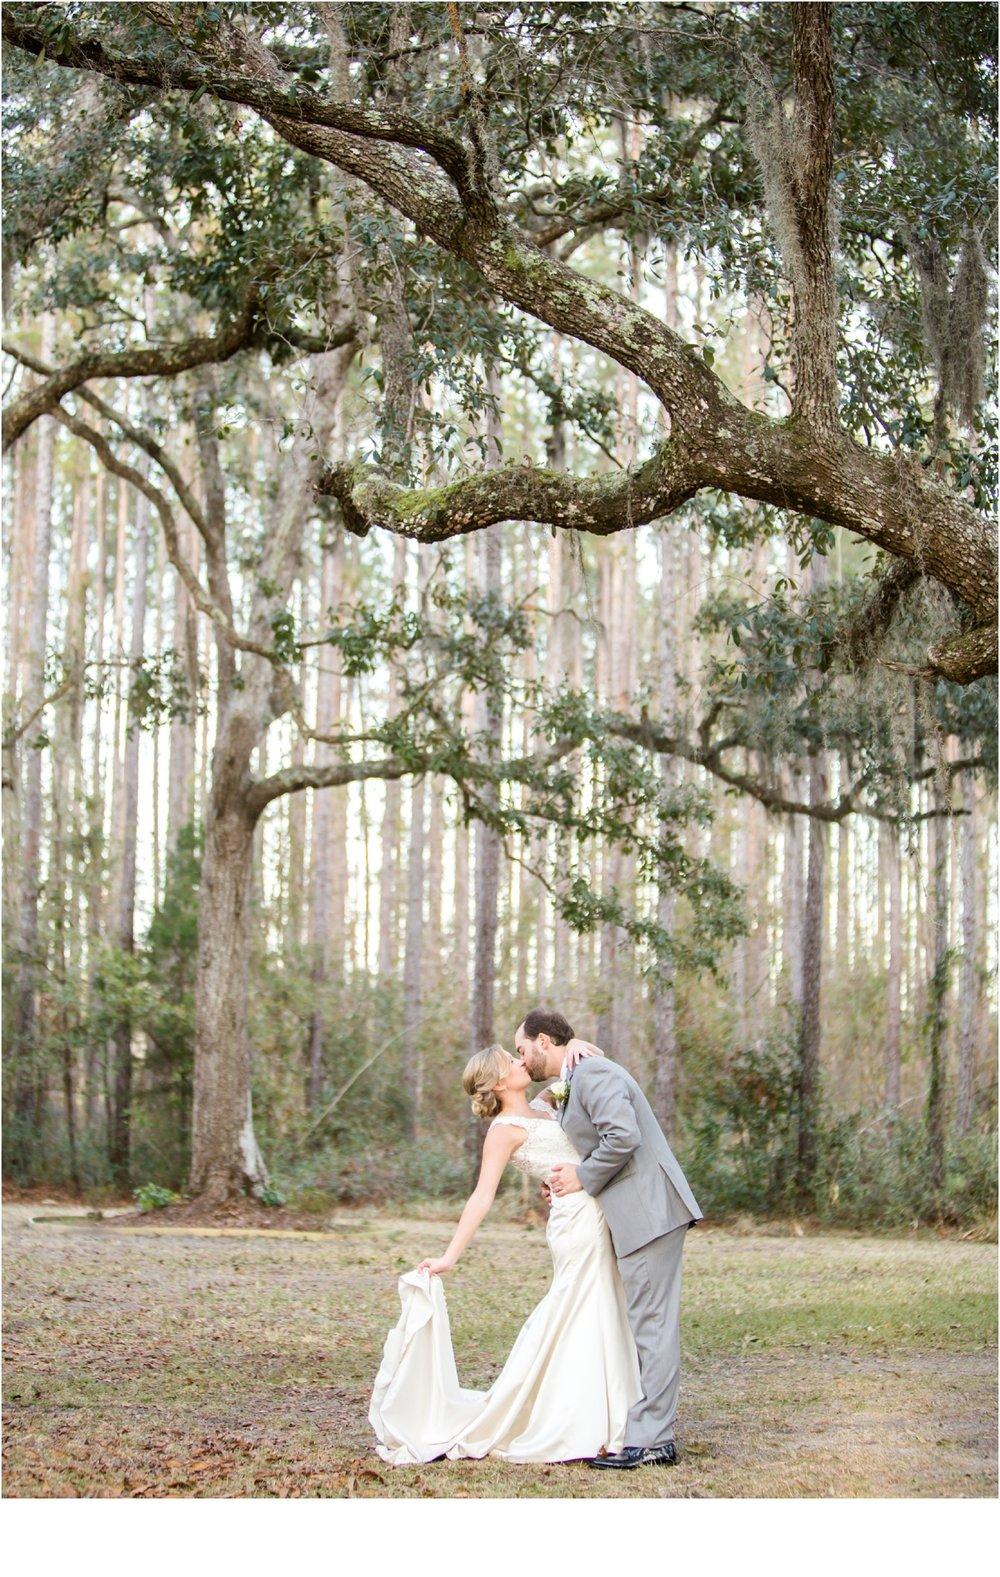 Rainey_Gregg_Photography_St._Simons_Island_Georgia_California_Wedding_Portrait_Photography_0499.jpg